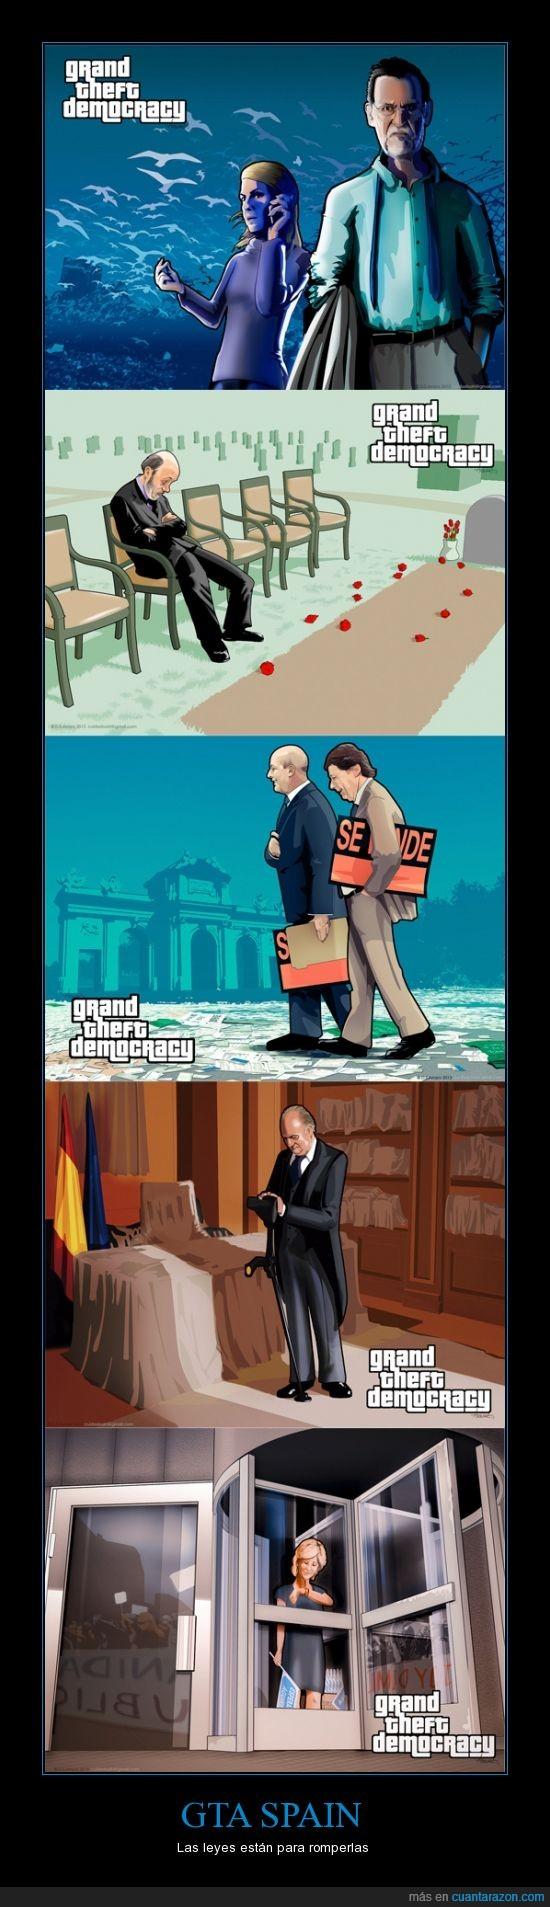 aguirre,cospedal,daniel s,grand theft auto,grand theft democracy,rajoy,videojuego